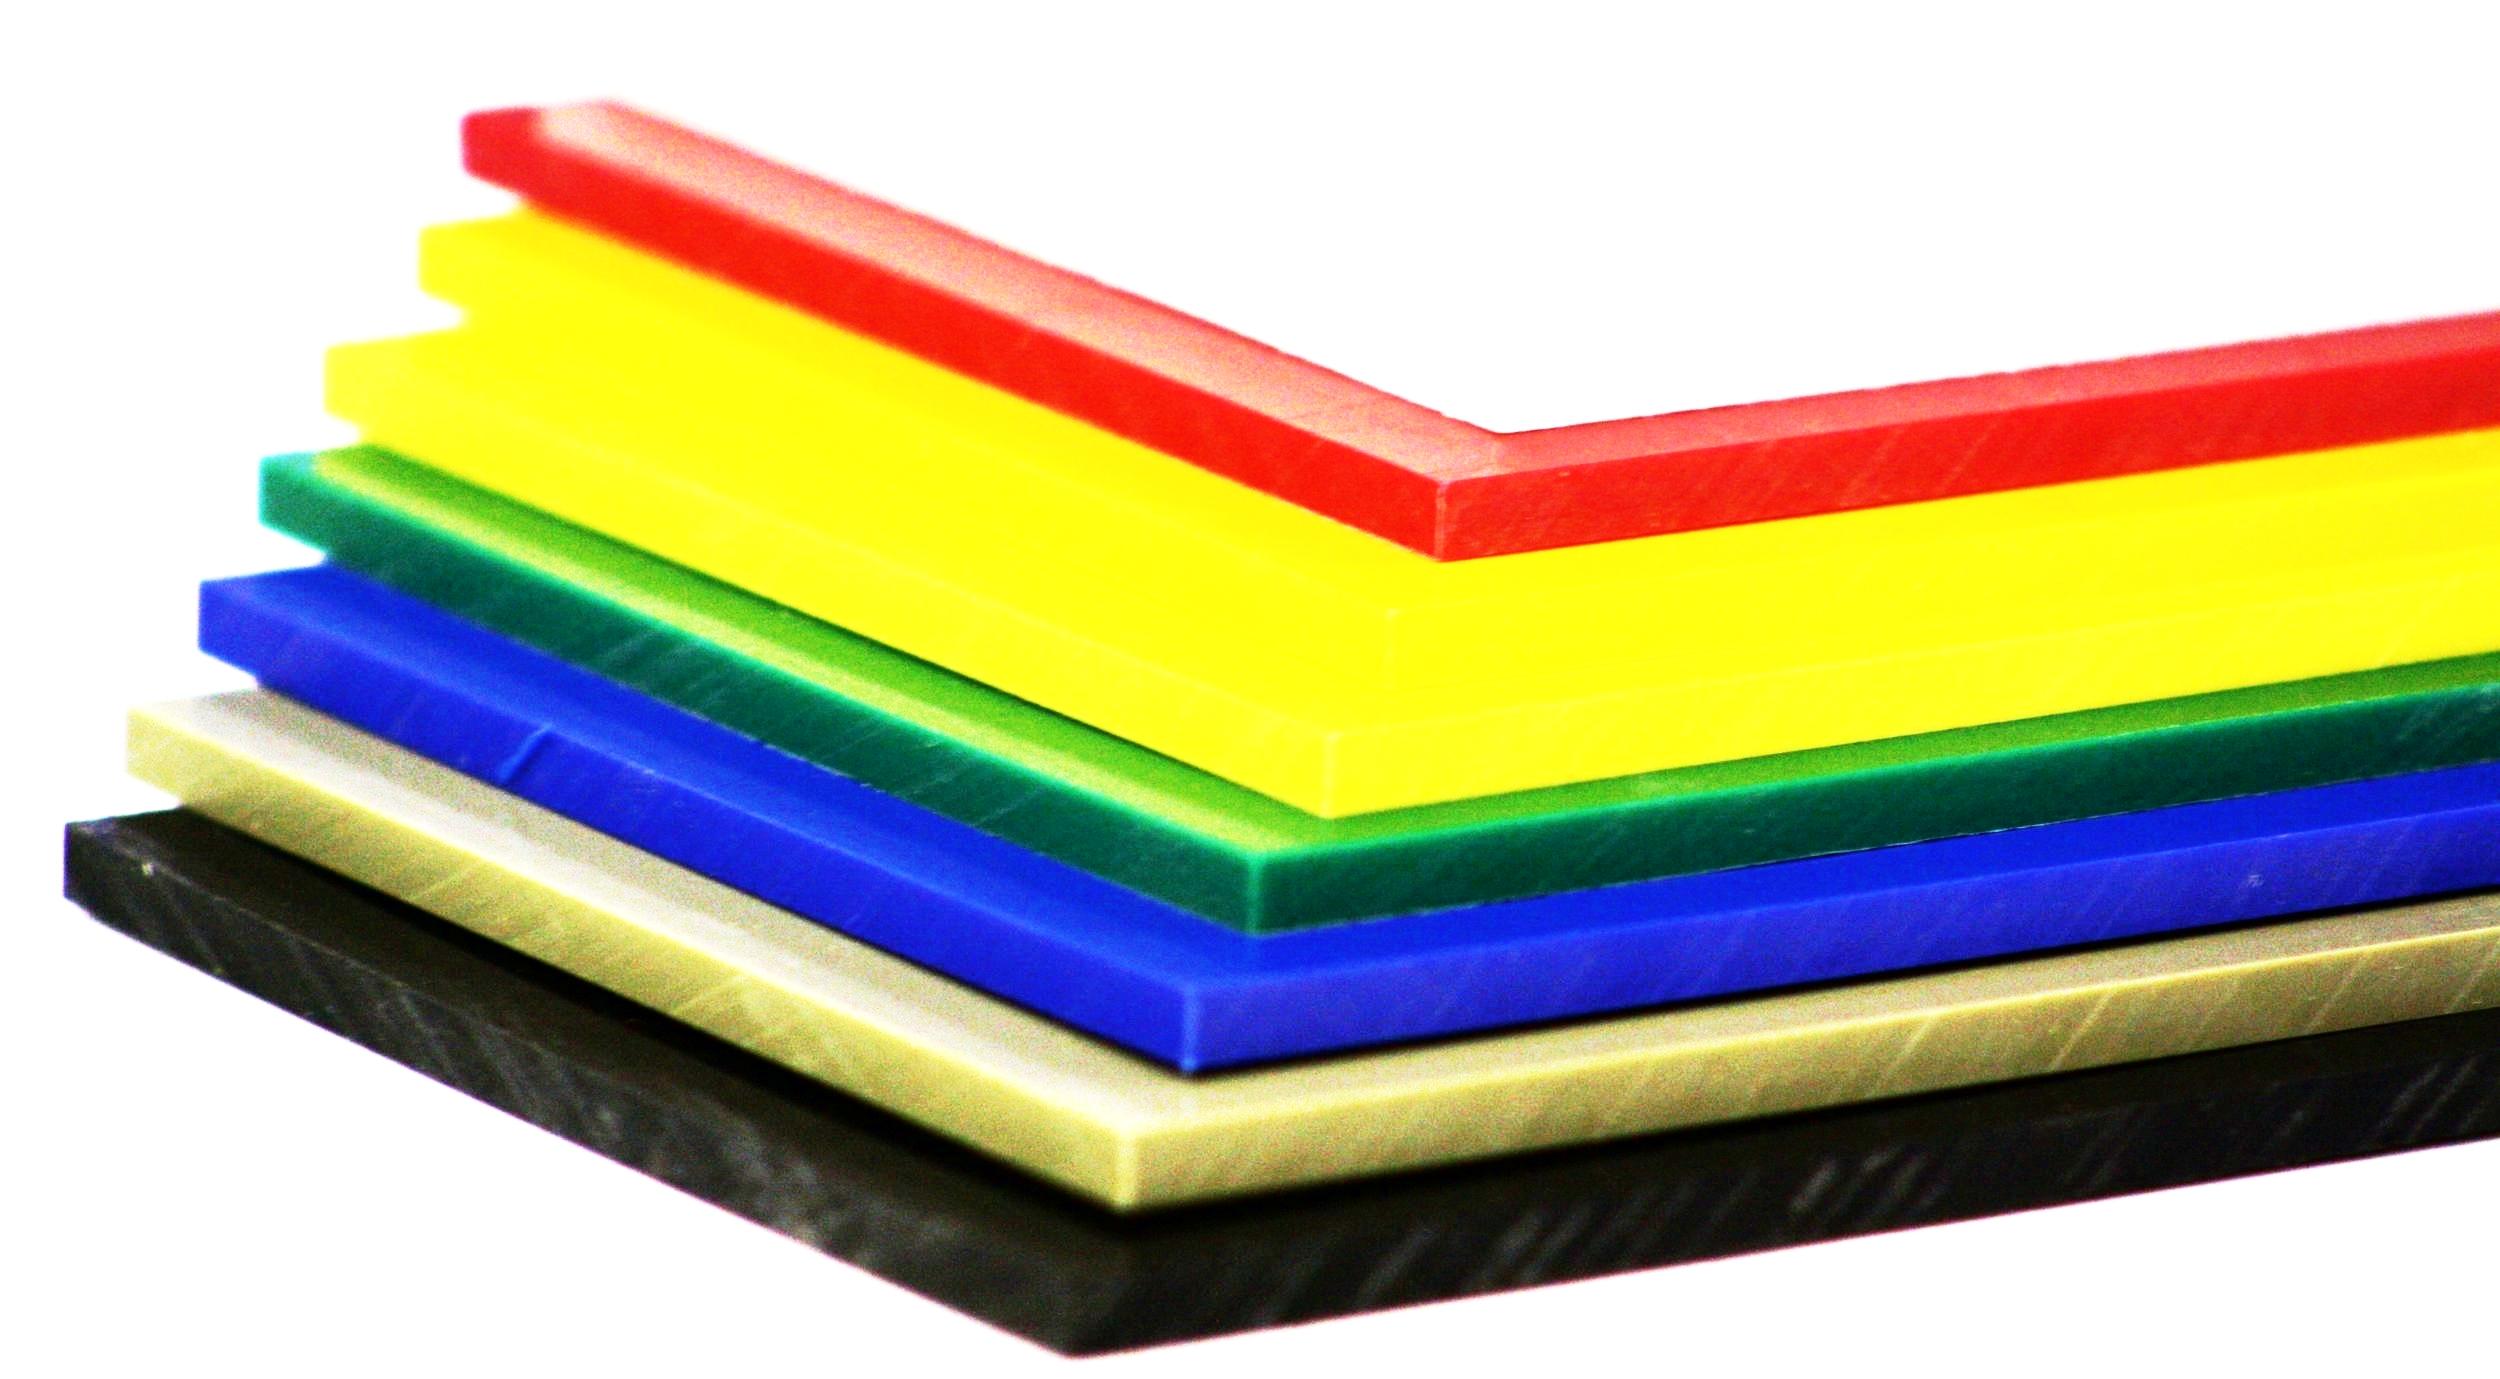 Sheet Rubber & Gasket Materials — Charleston Rubber & Gasket